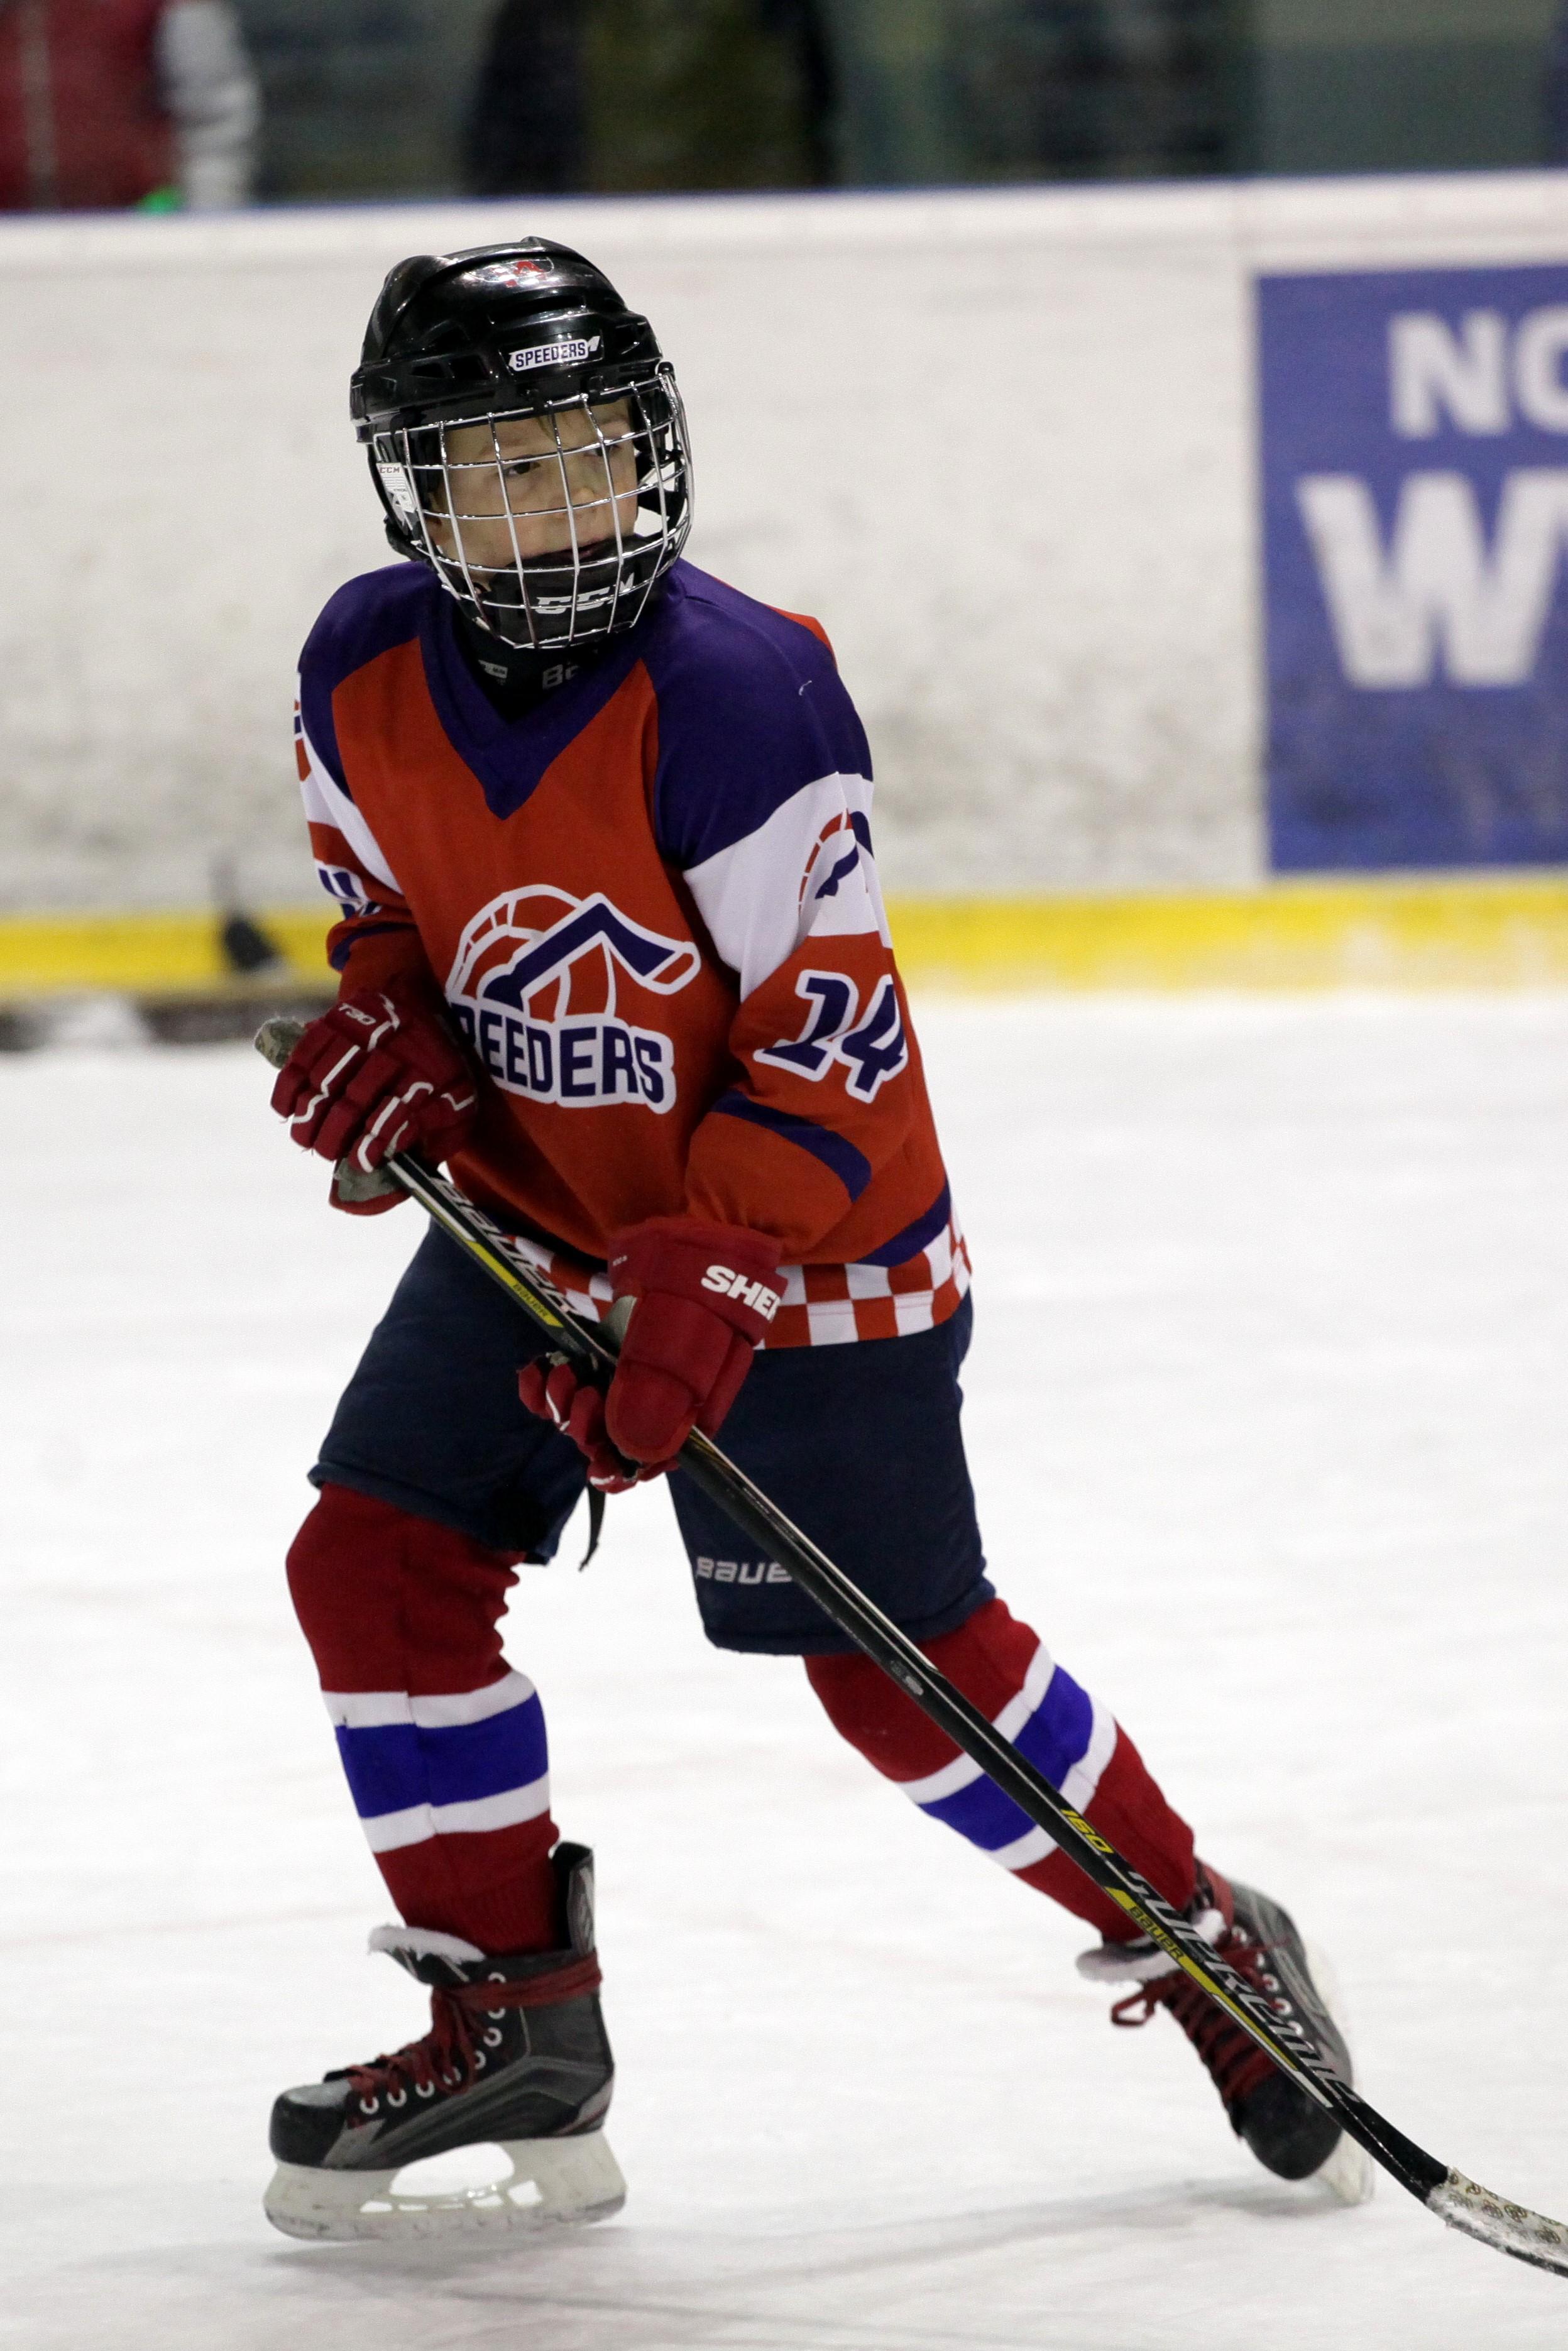 david hruska deti hokej speeders bratislava 1